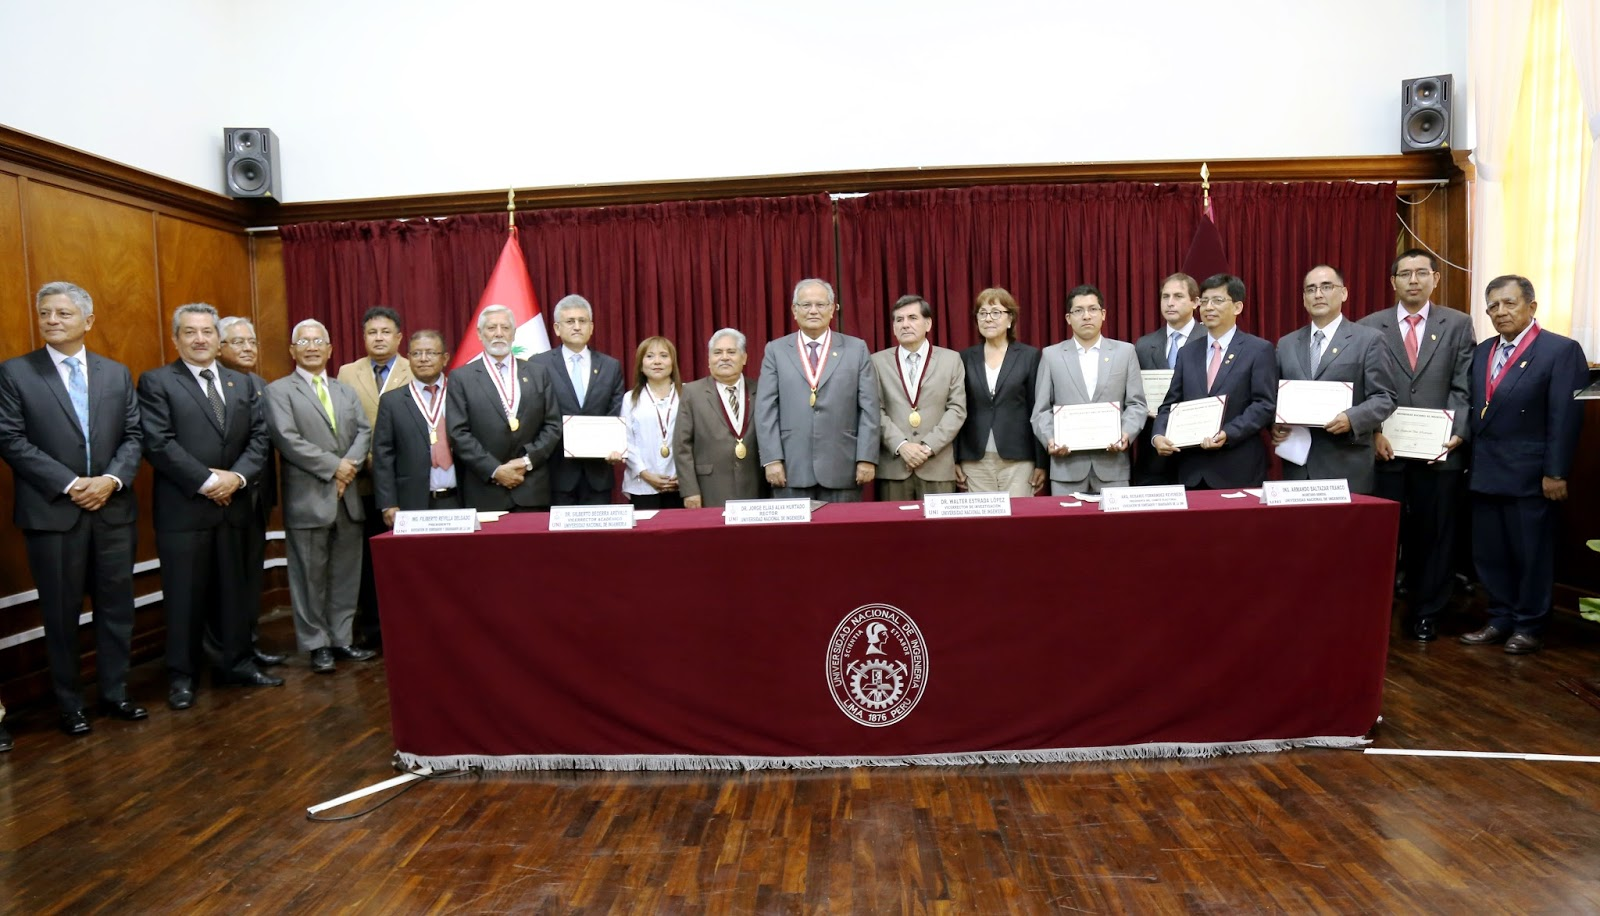 Oficina de relaciones p blicas uni jurament nueva for Oficina ing malaga